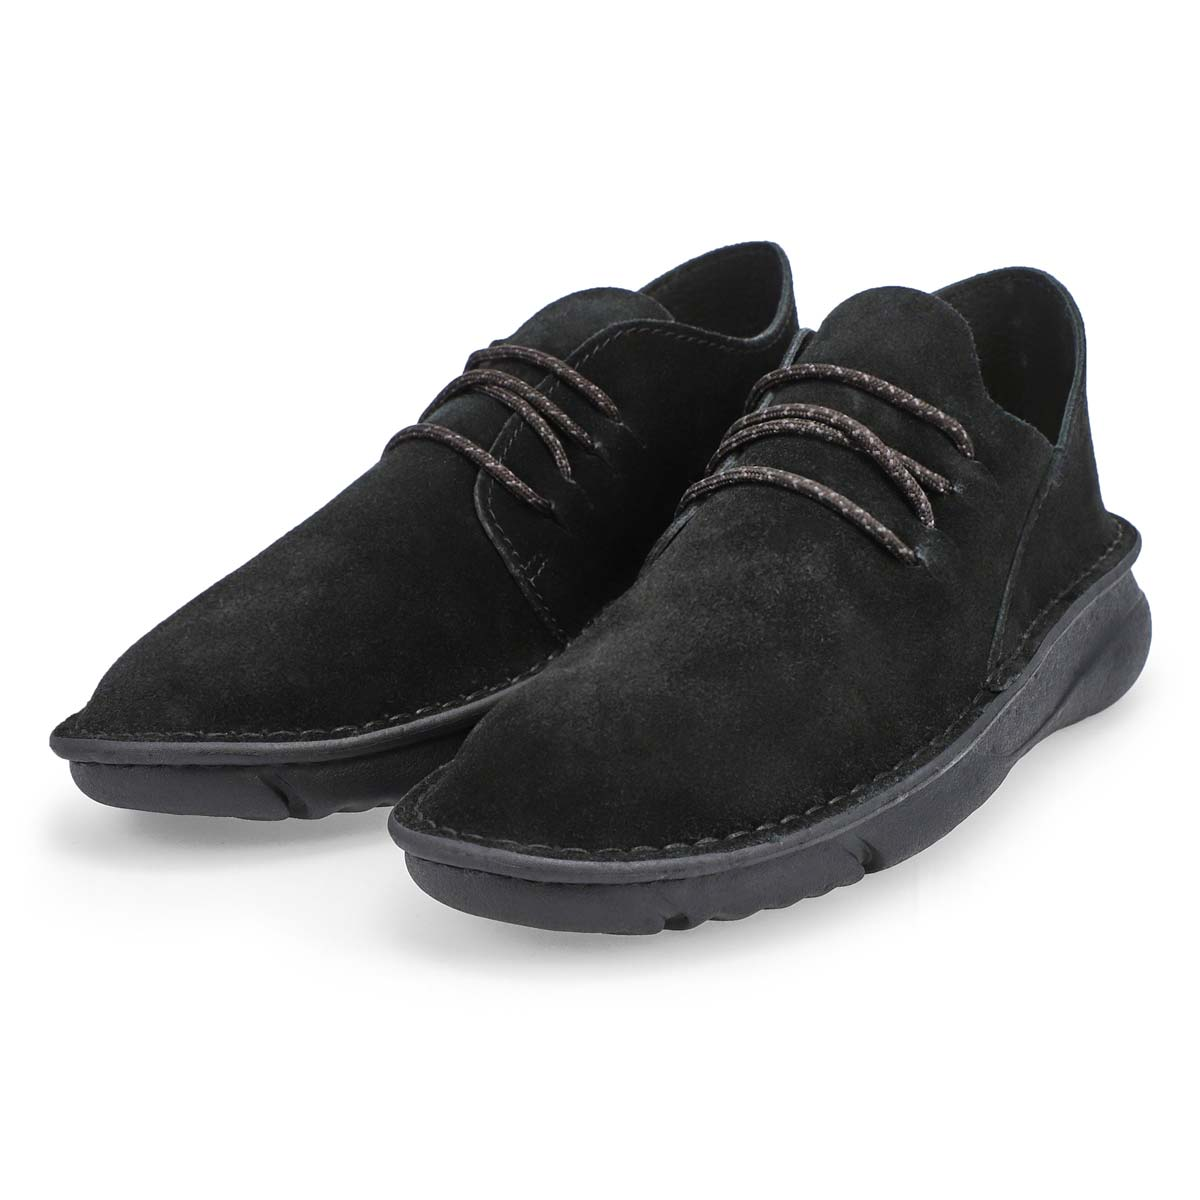 Men's Origin Sustainable Sport Shoe - Black